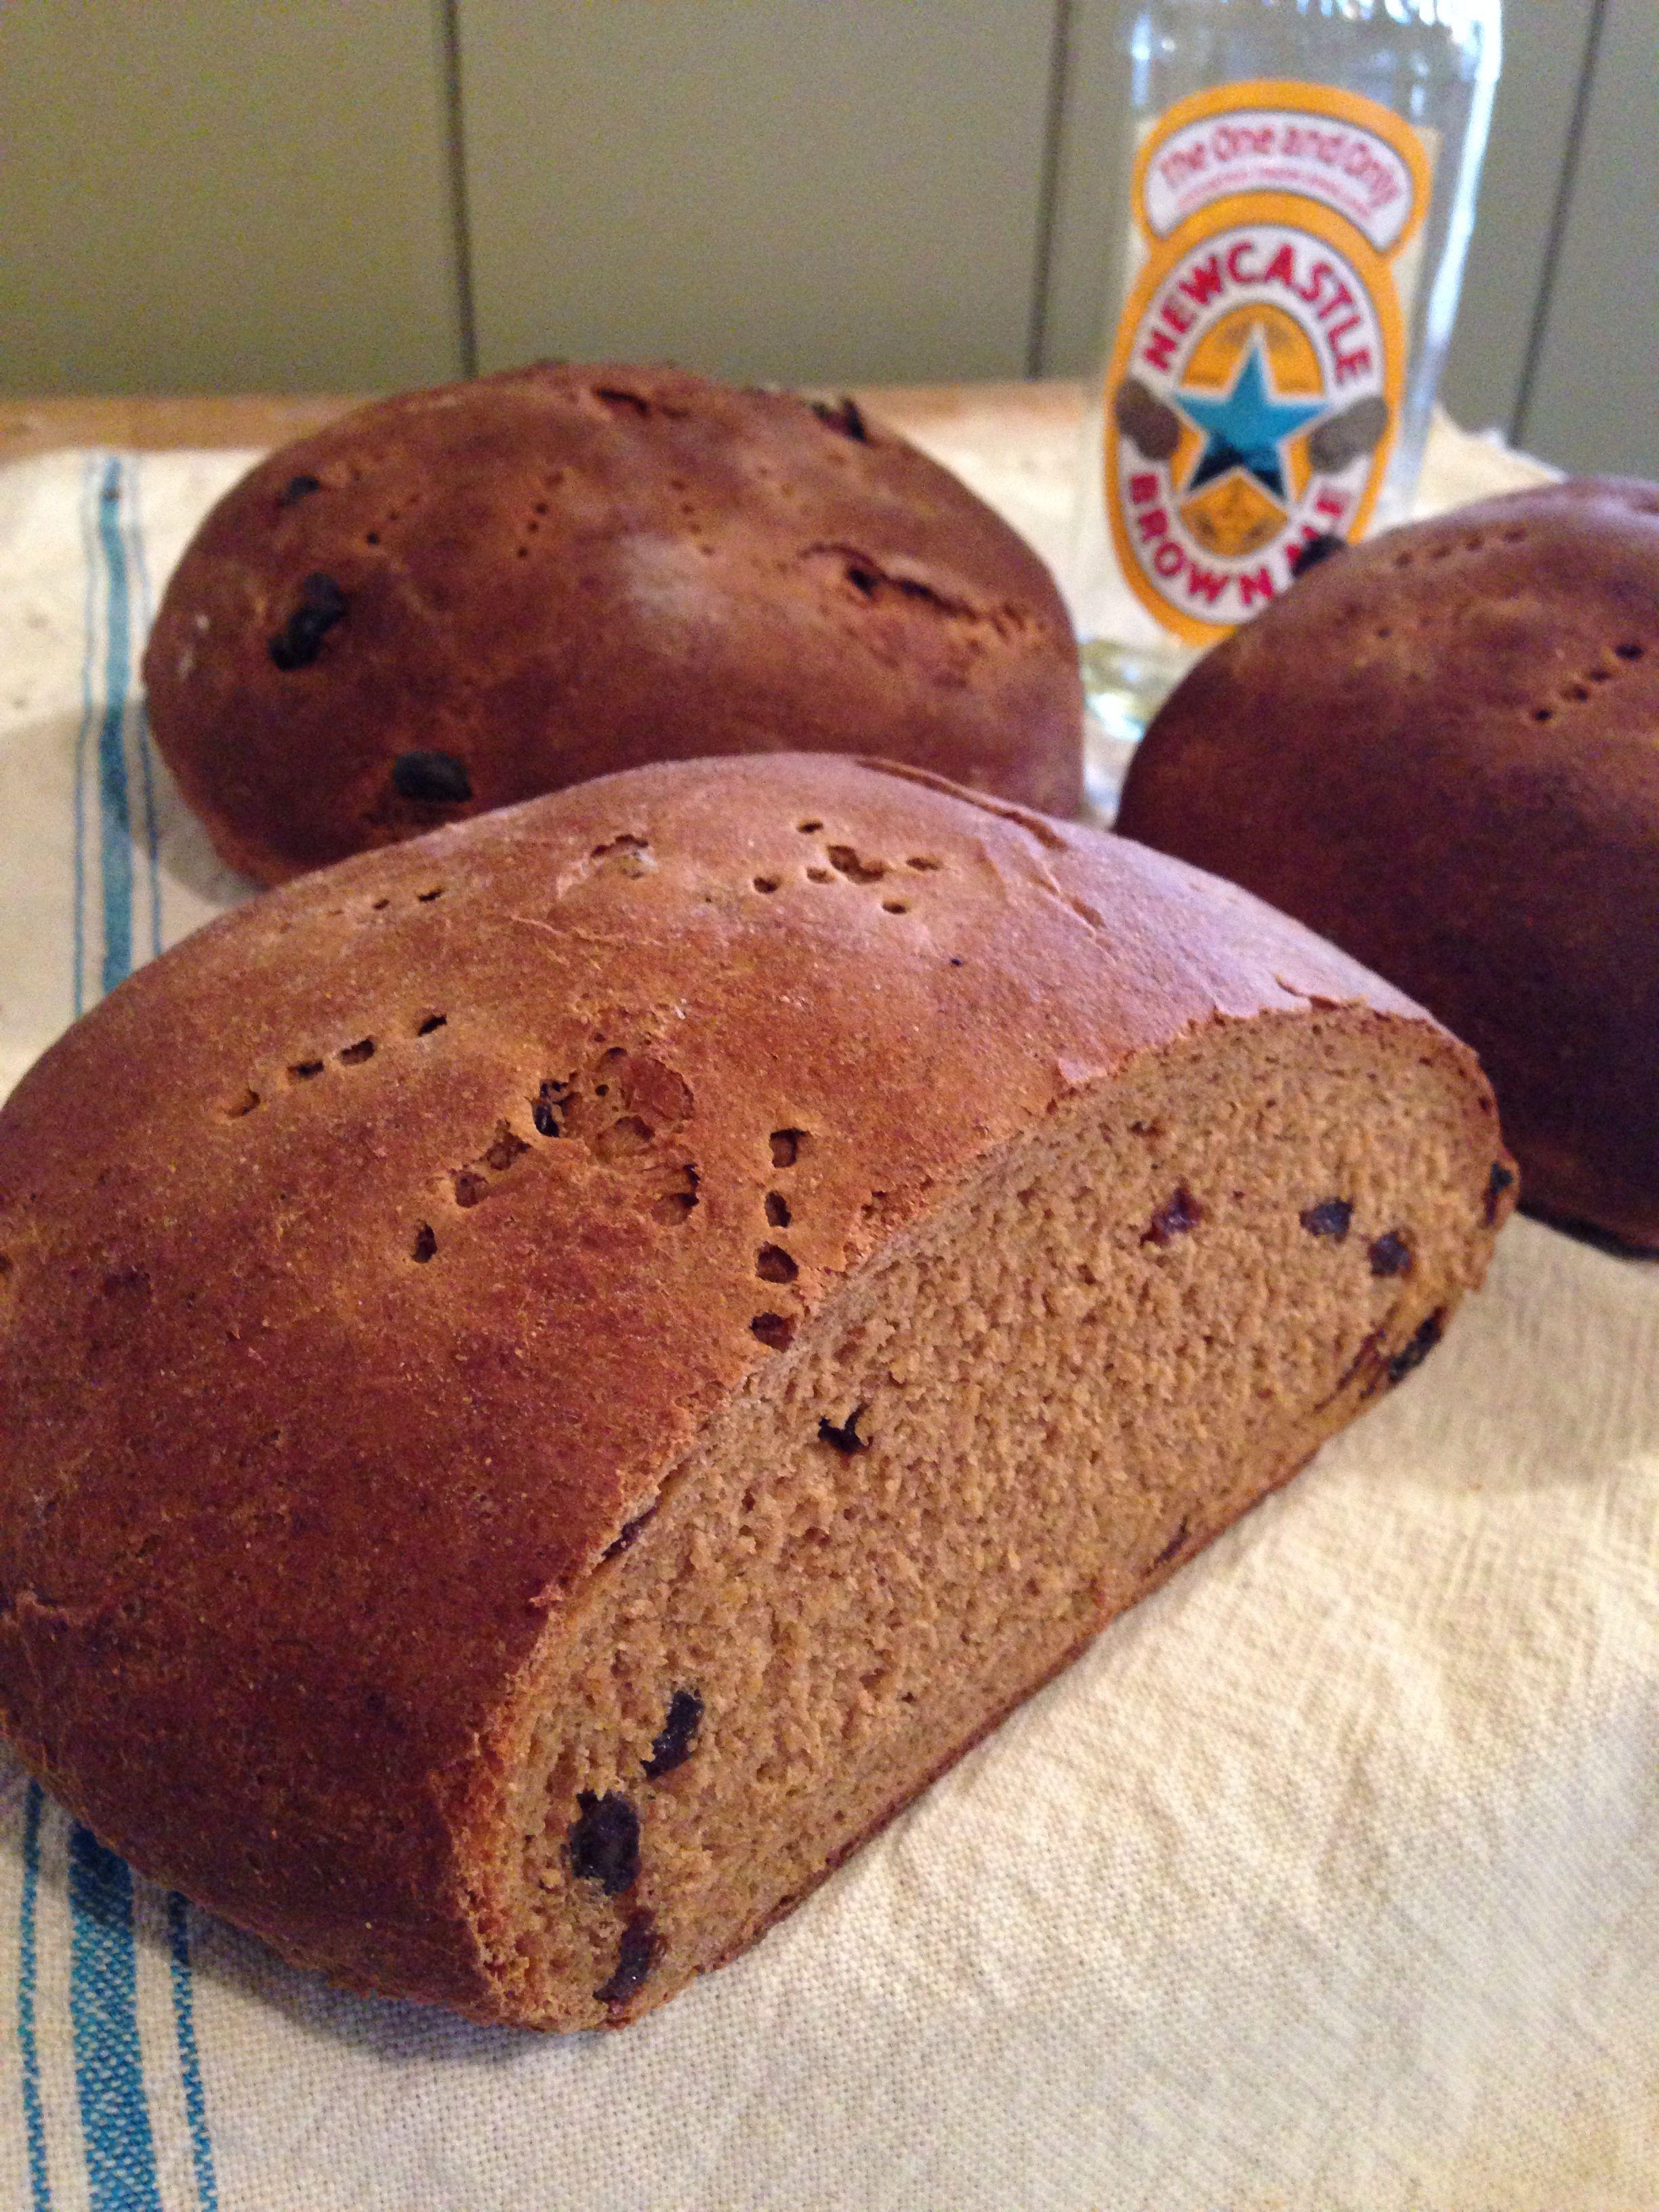 Raisin Beer Bread Olbrod The Great Scandinavian Baking Book Baking Book Beer Bread Scandinavian Food